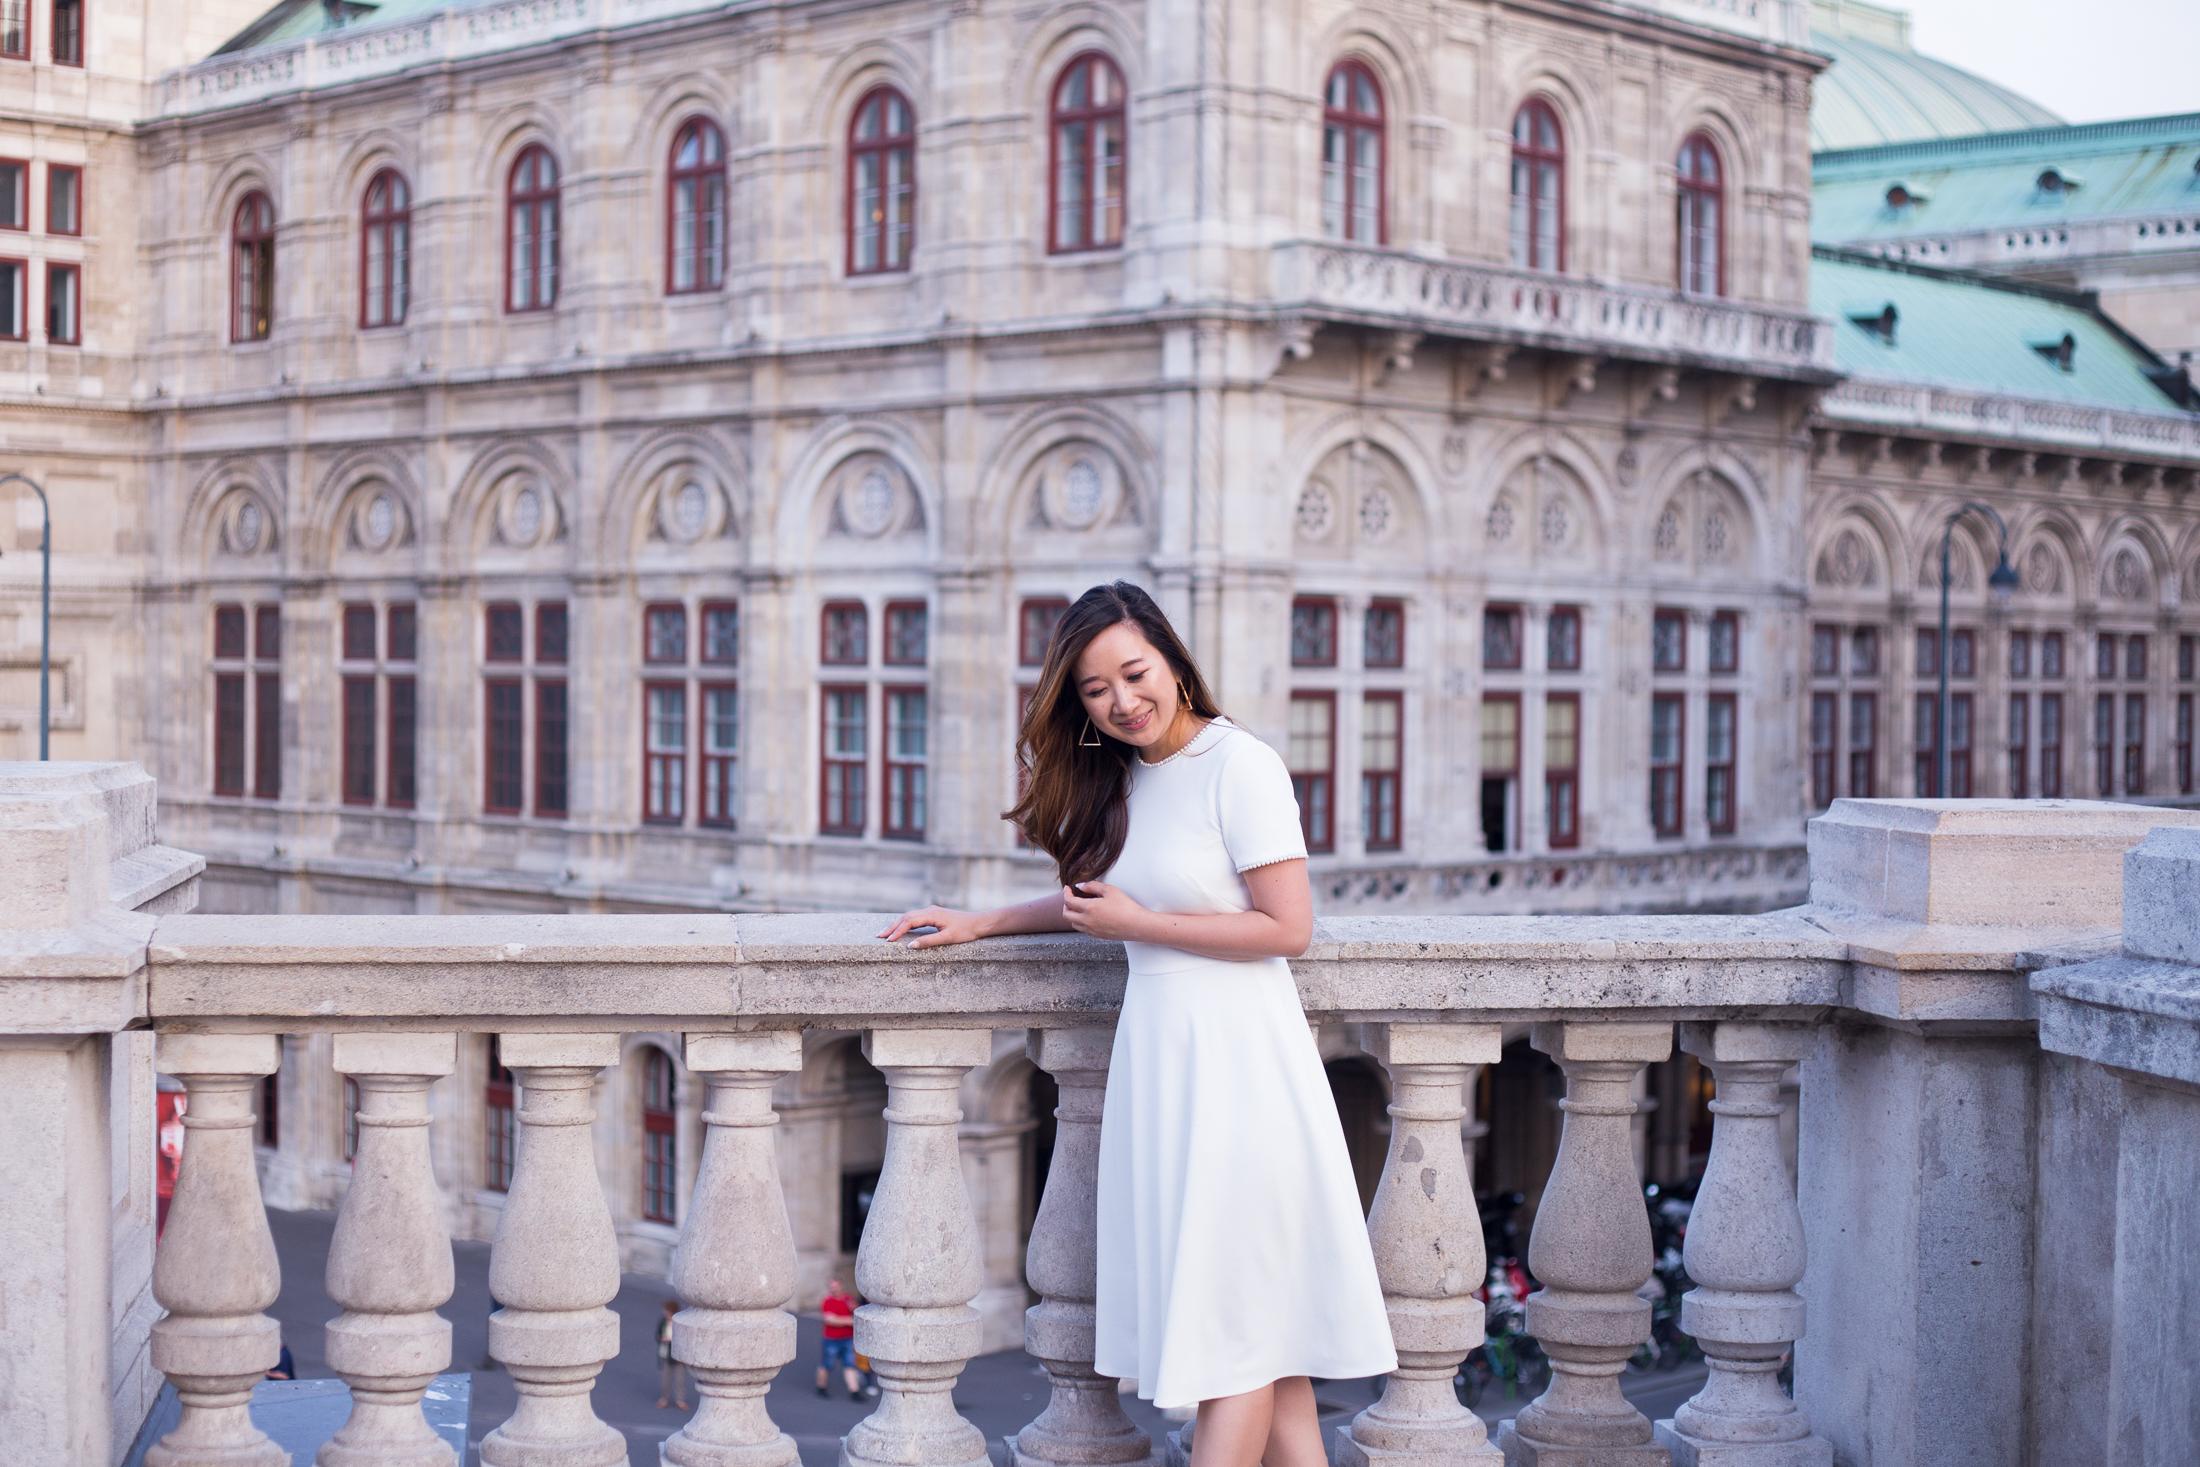 Taken at the Albertinaplatz, in front of the Opera House. Photo by  Akos Vincze .